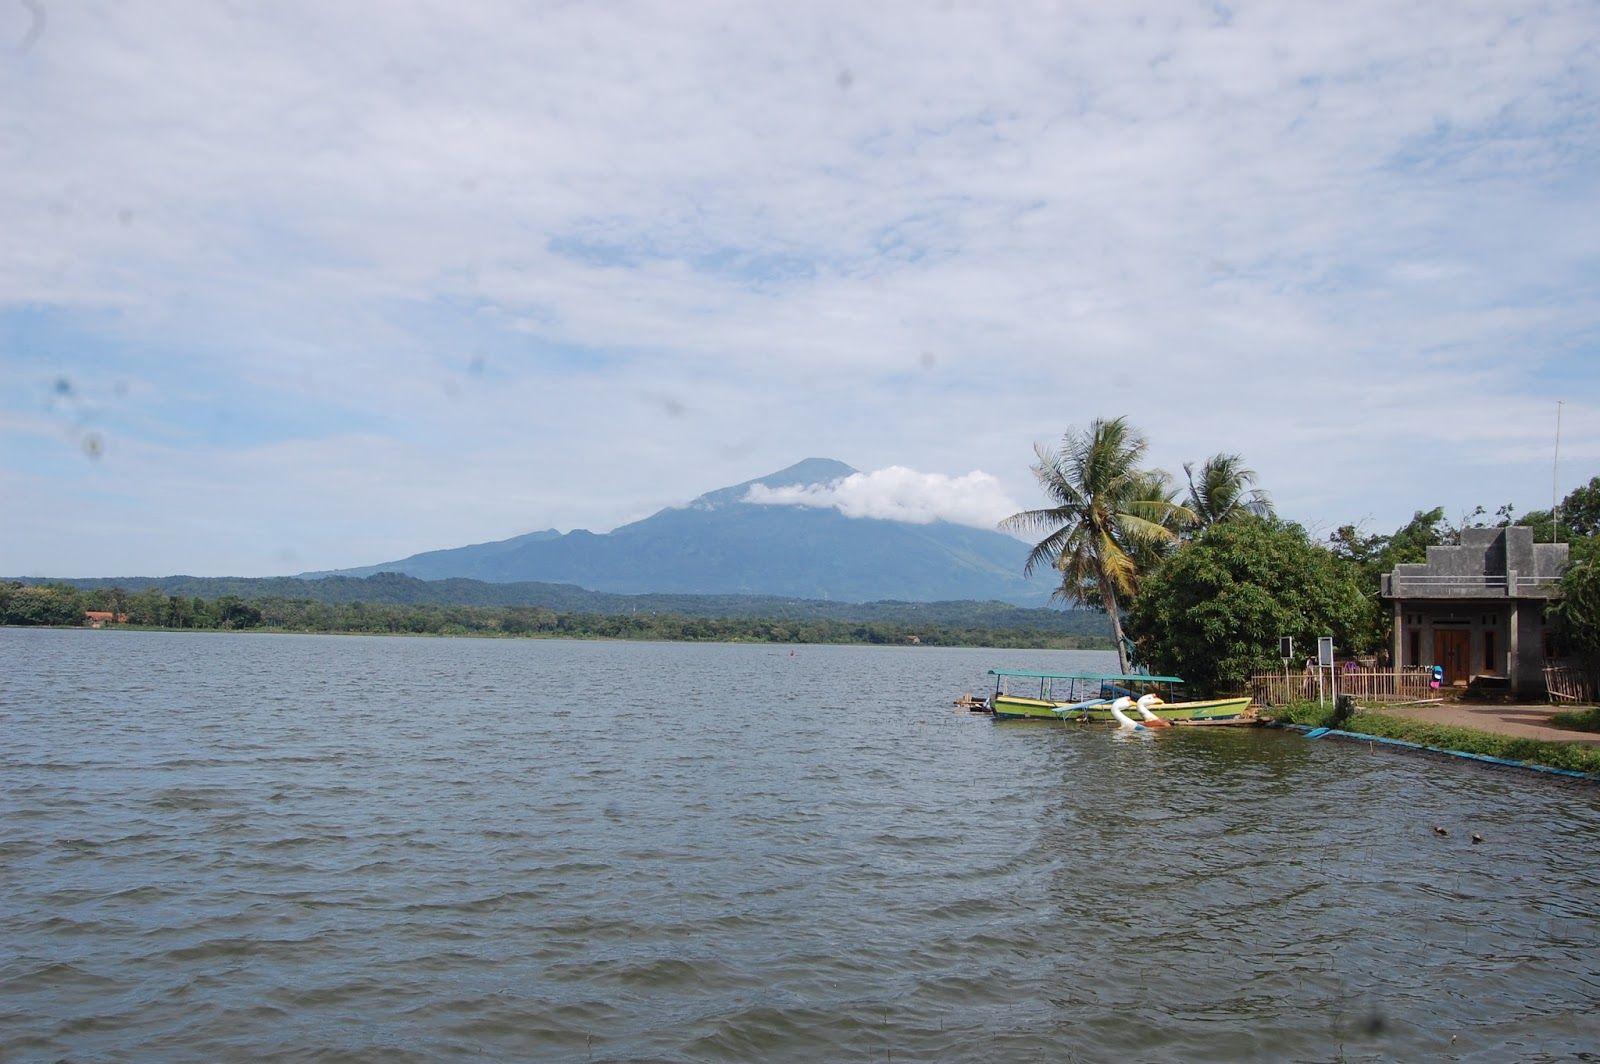 Setu Sedong Pemandangan Alam Nan Eksotis Di Cirebon Jawa Barat Kota Cirebon Pemandangan Pantai